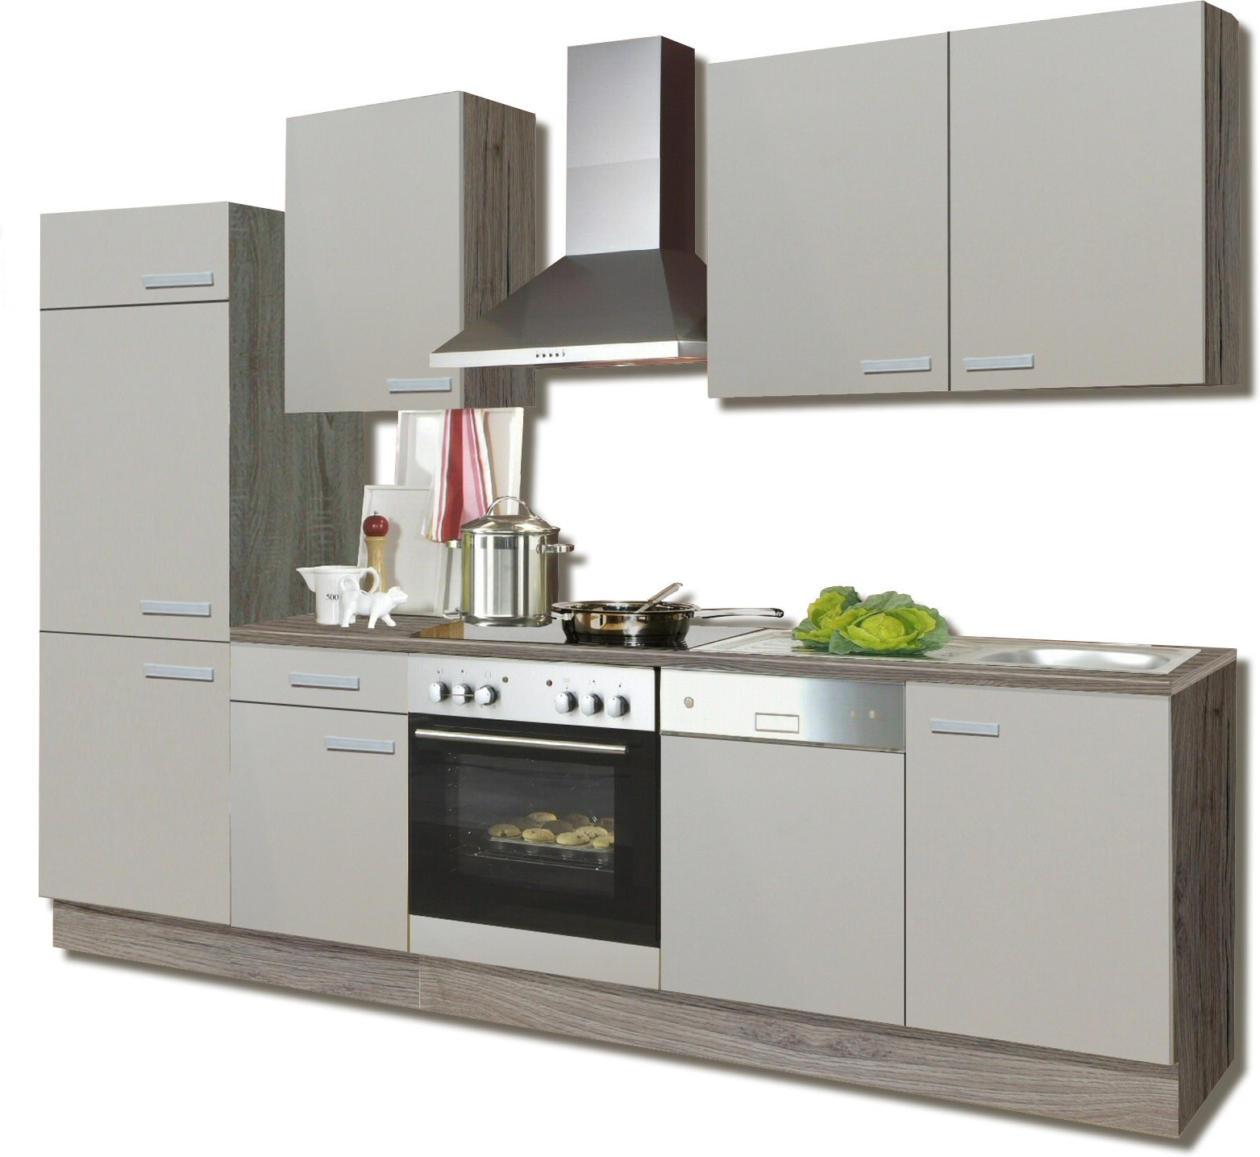 k chenzeile roller home design inspiration und m bel ideen. Black Bedroom Furniture Sets. Home Design Ideas